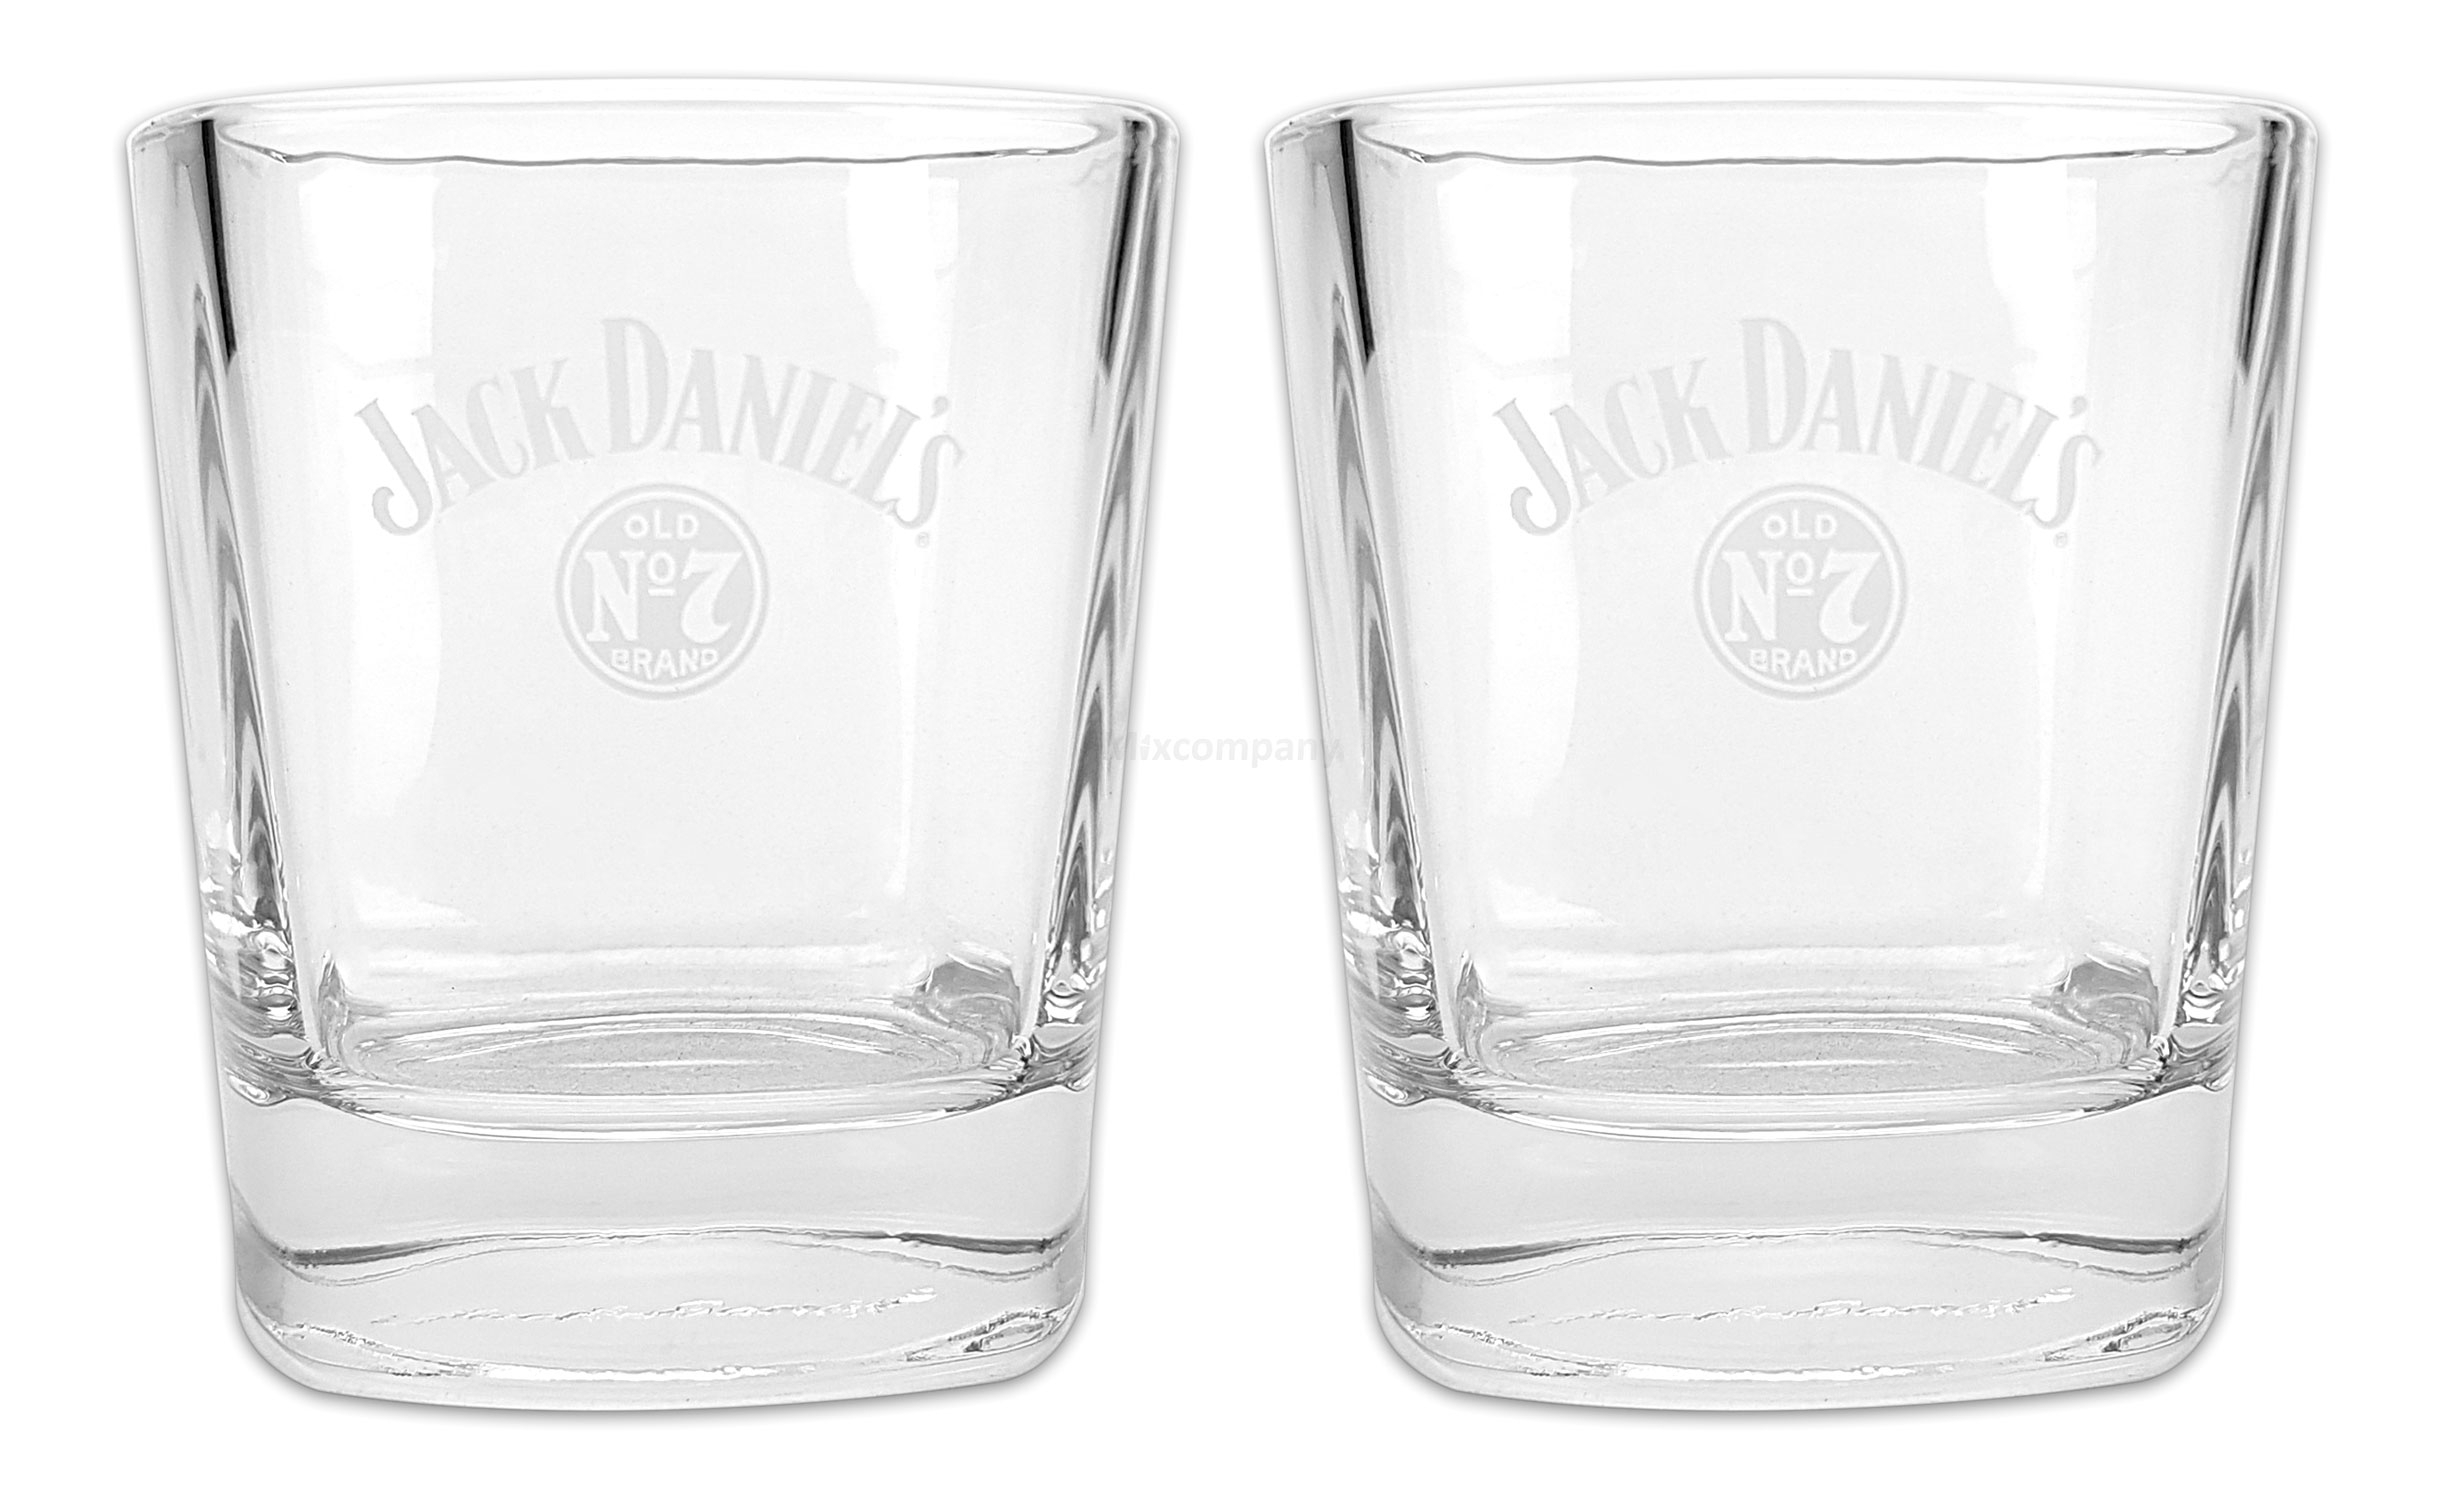 Jack Daniels Old no 7 Whiskey Tumbler Glas Gläser Set - 2x Tumbler